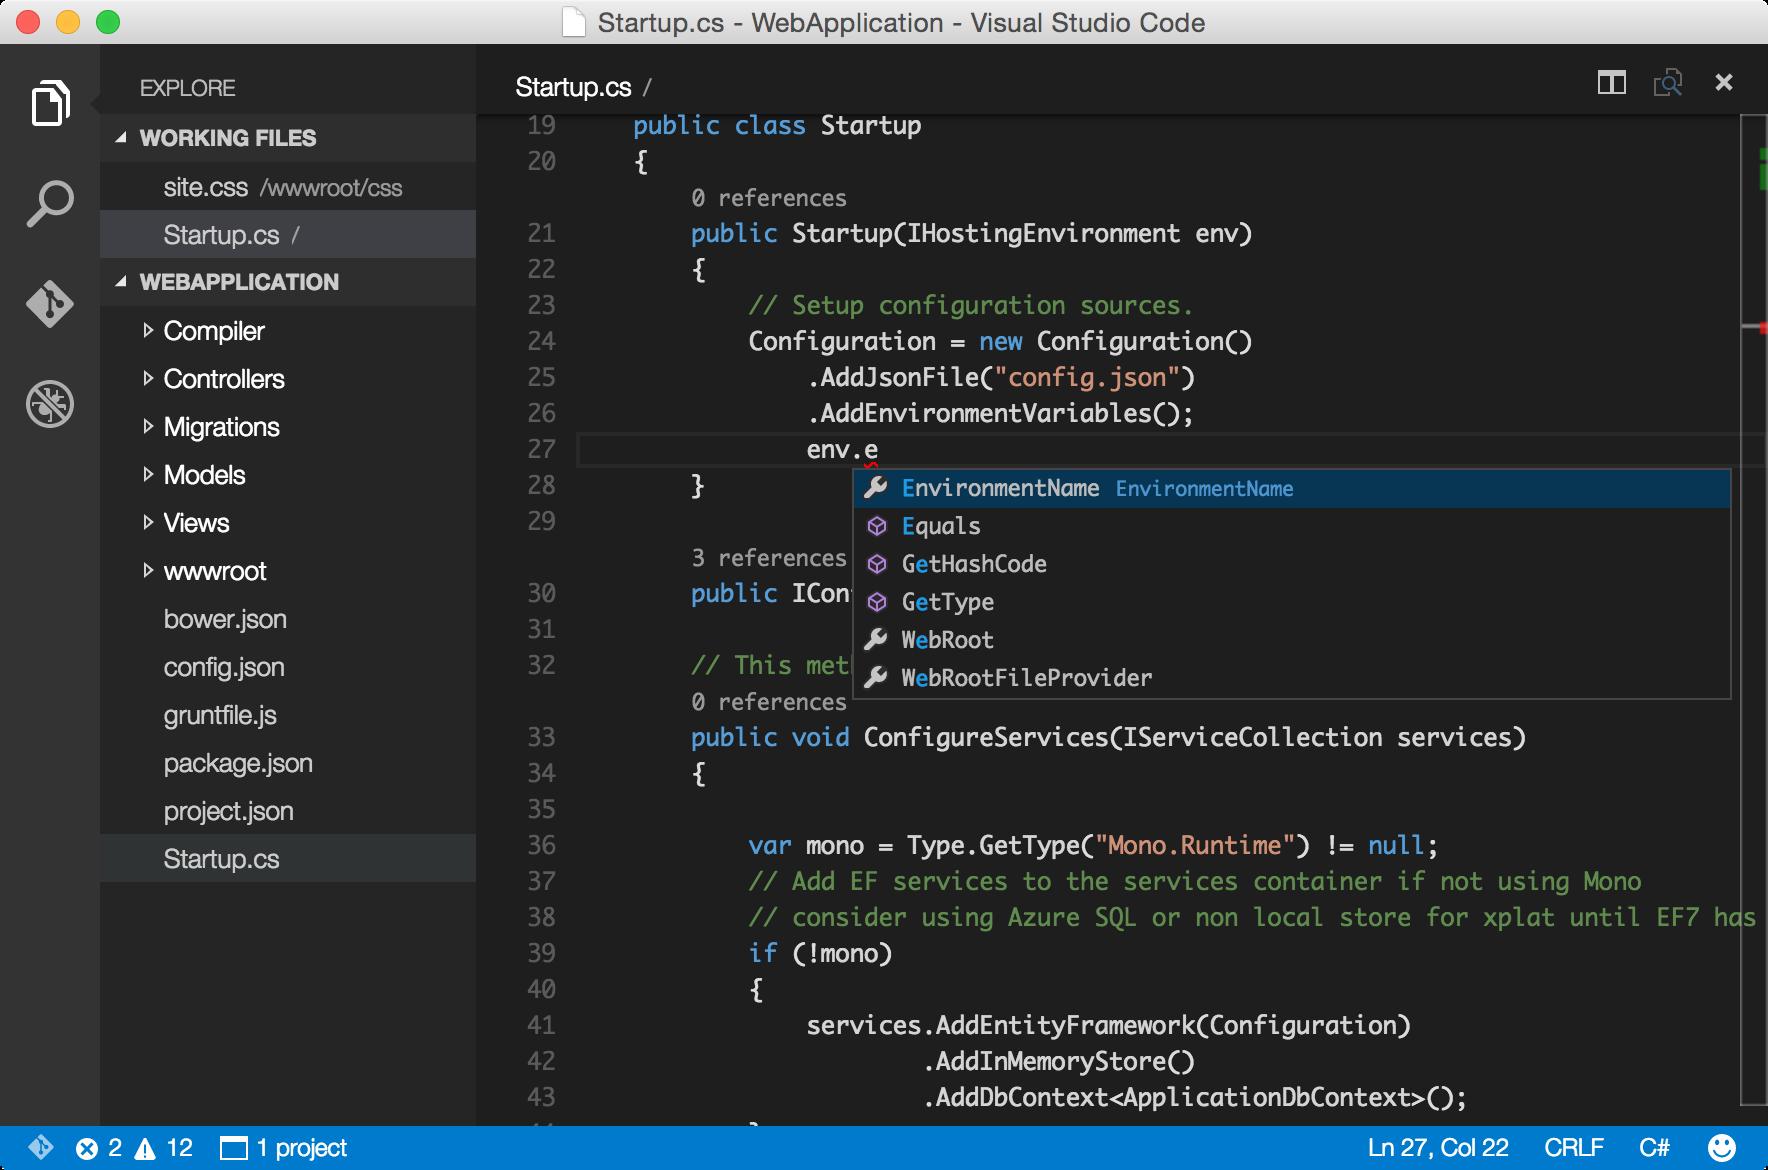 Visual Studio Code for OS X